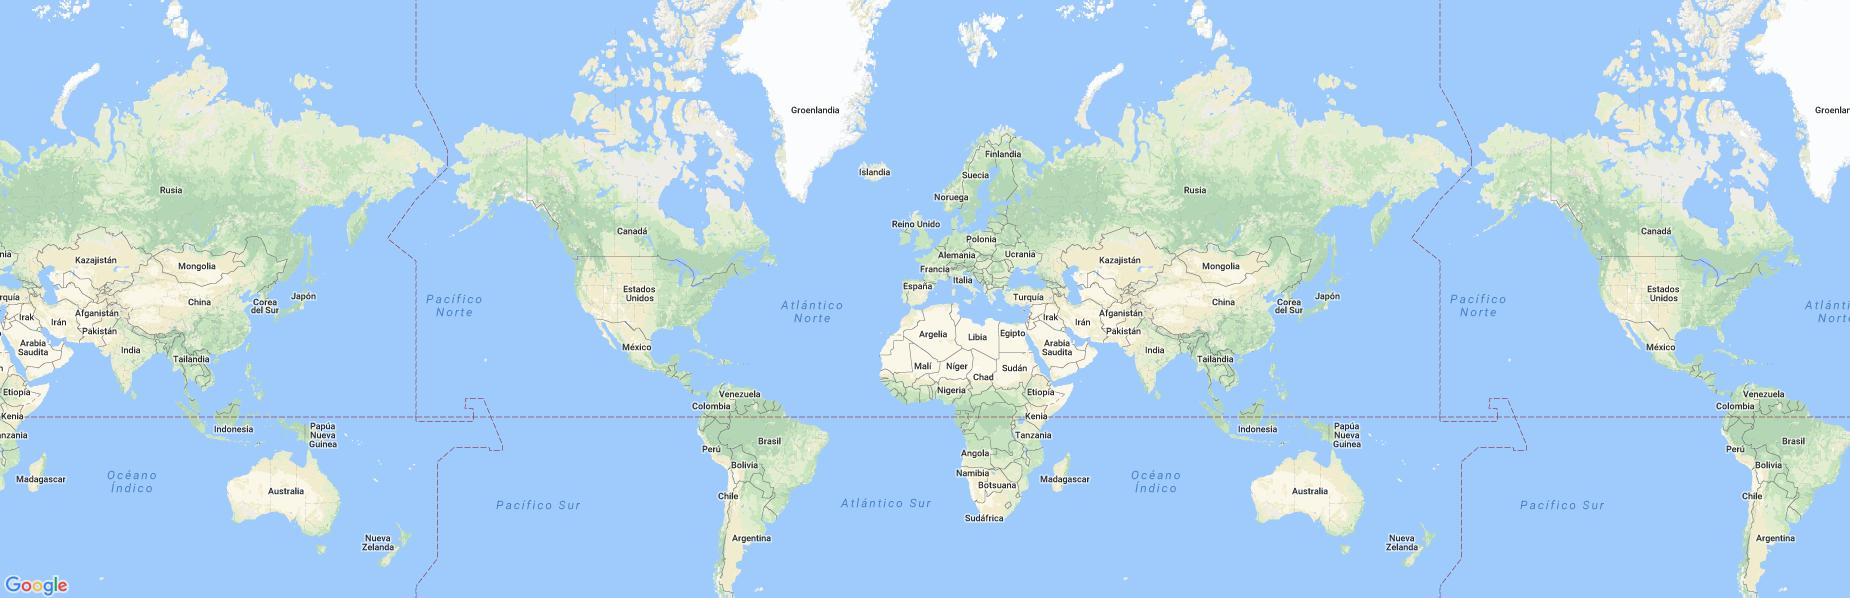 Static image map